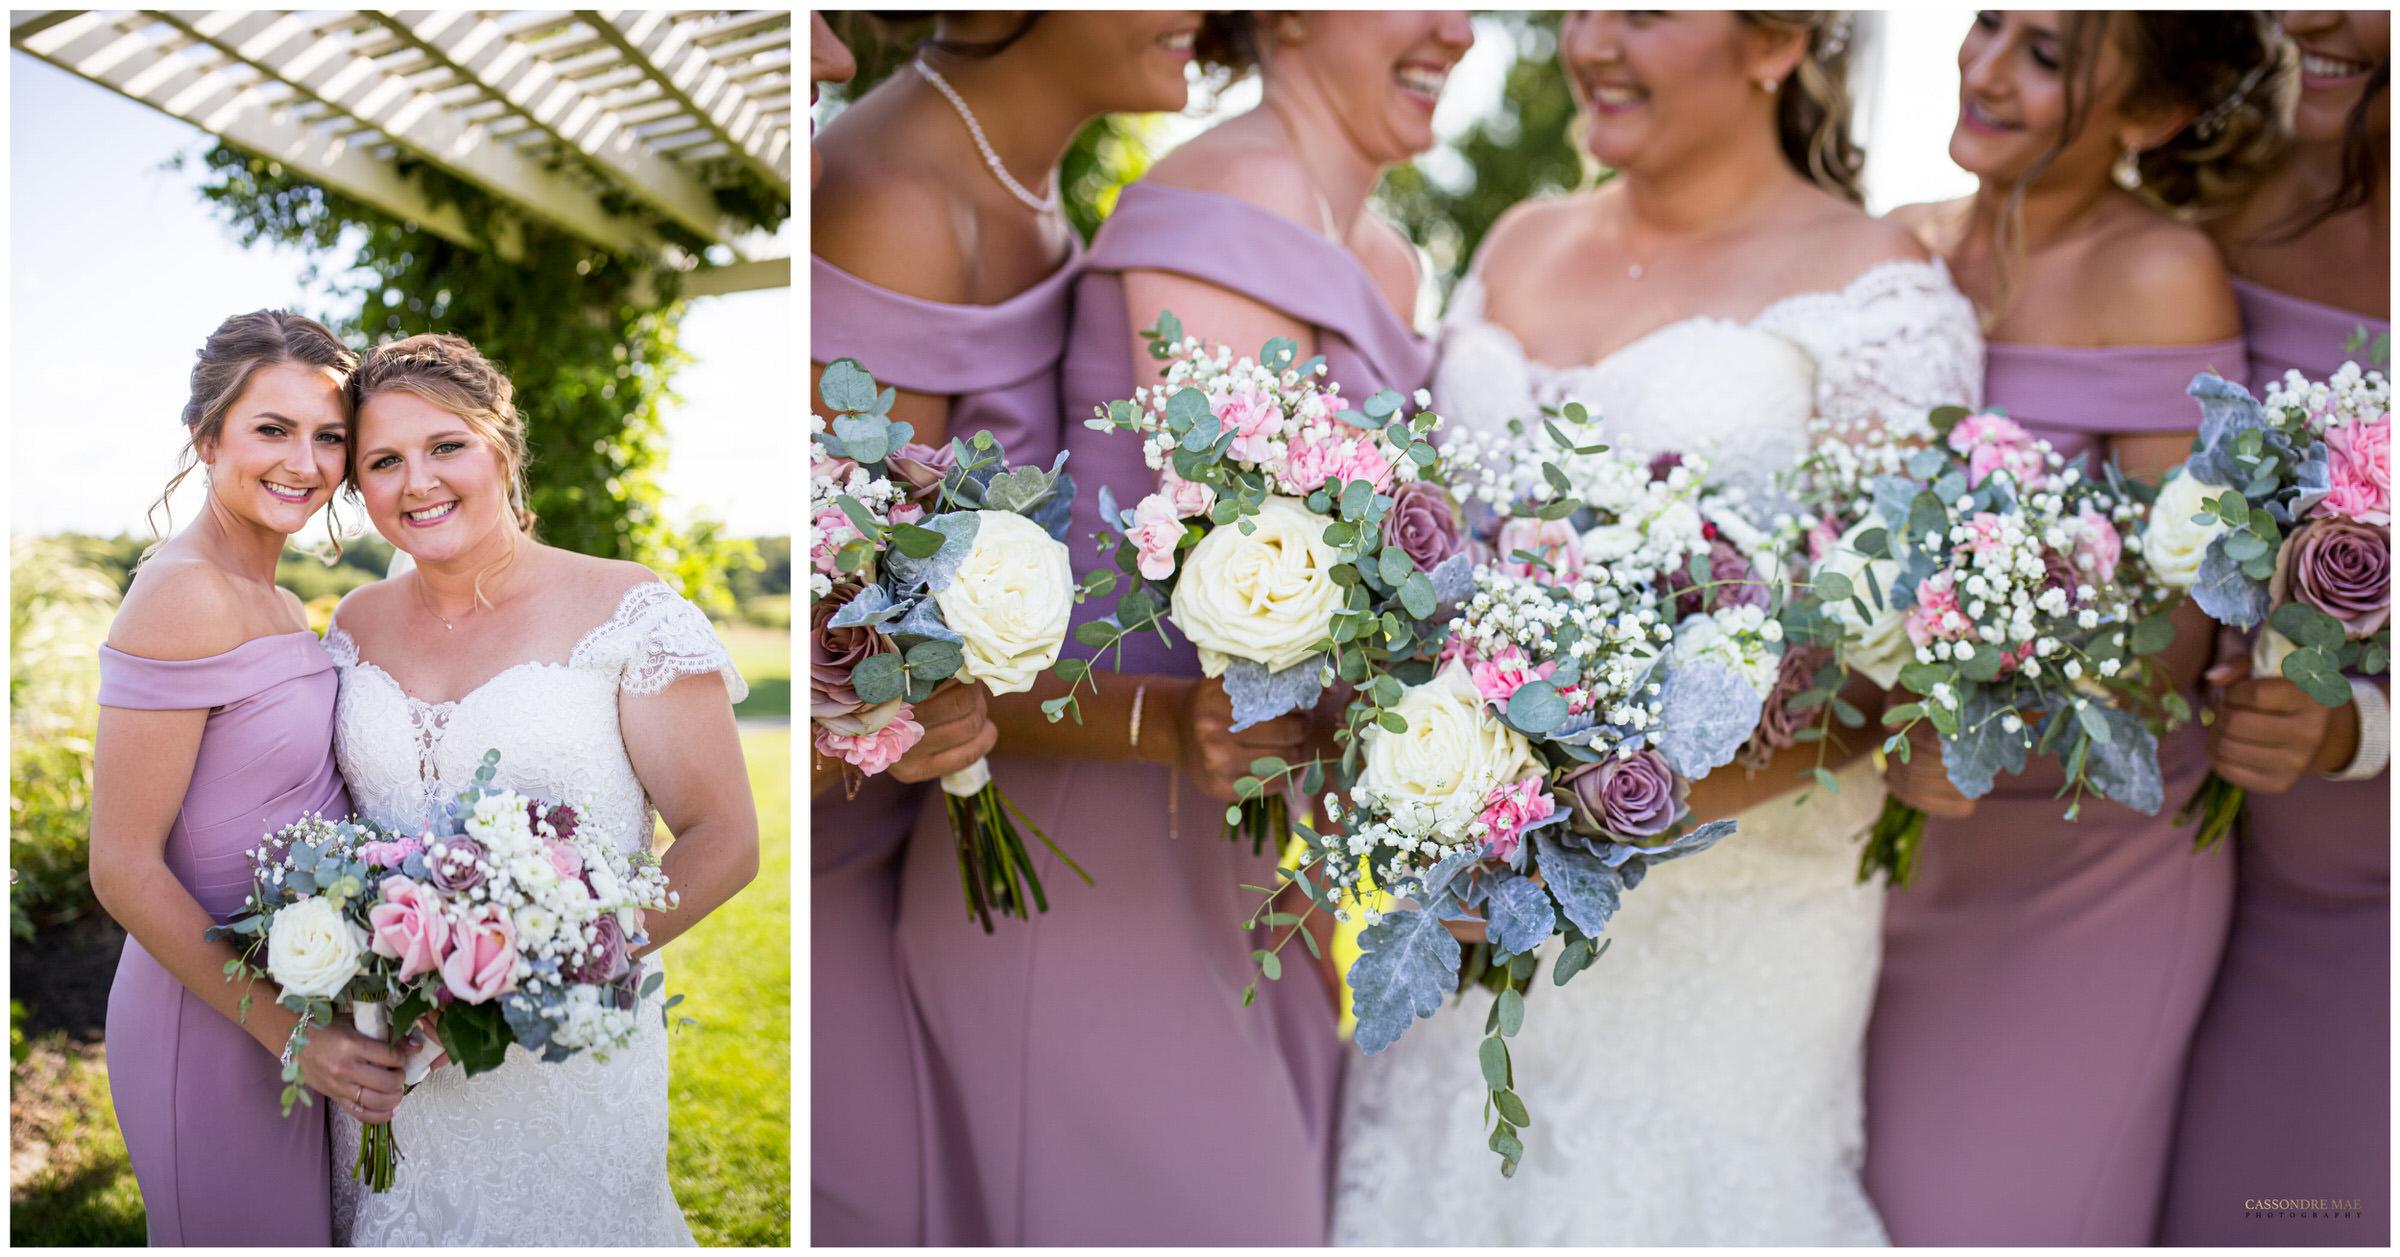 Cassondre Mae Photography The Links Wedding Photographer 12.jpg